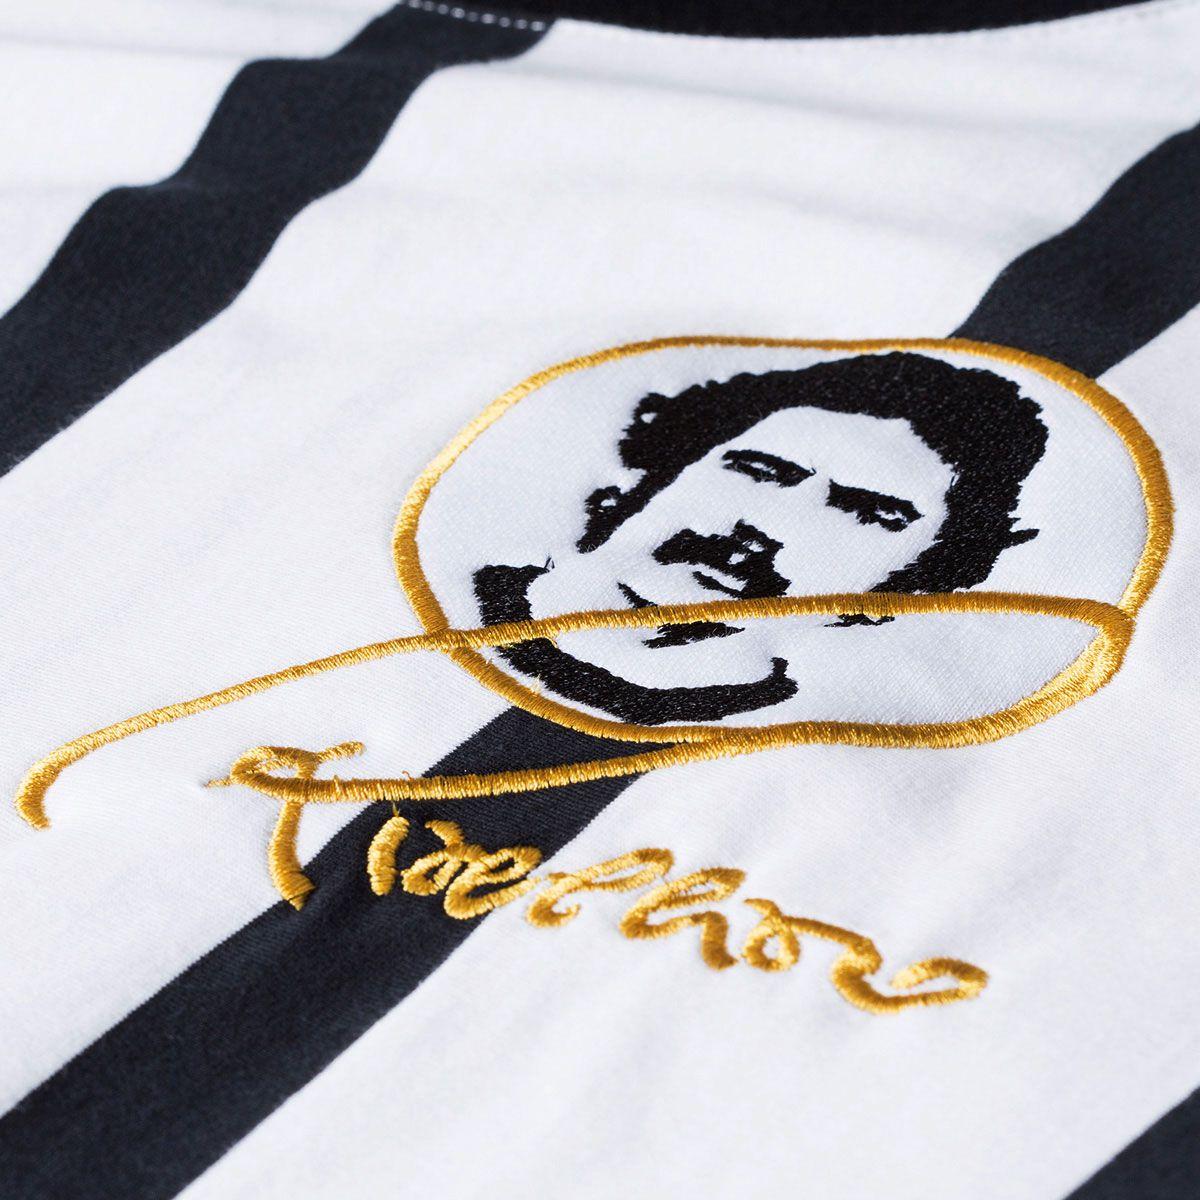 Camisa Retrô Gol Rivelino Réplica Ex - Corinthians